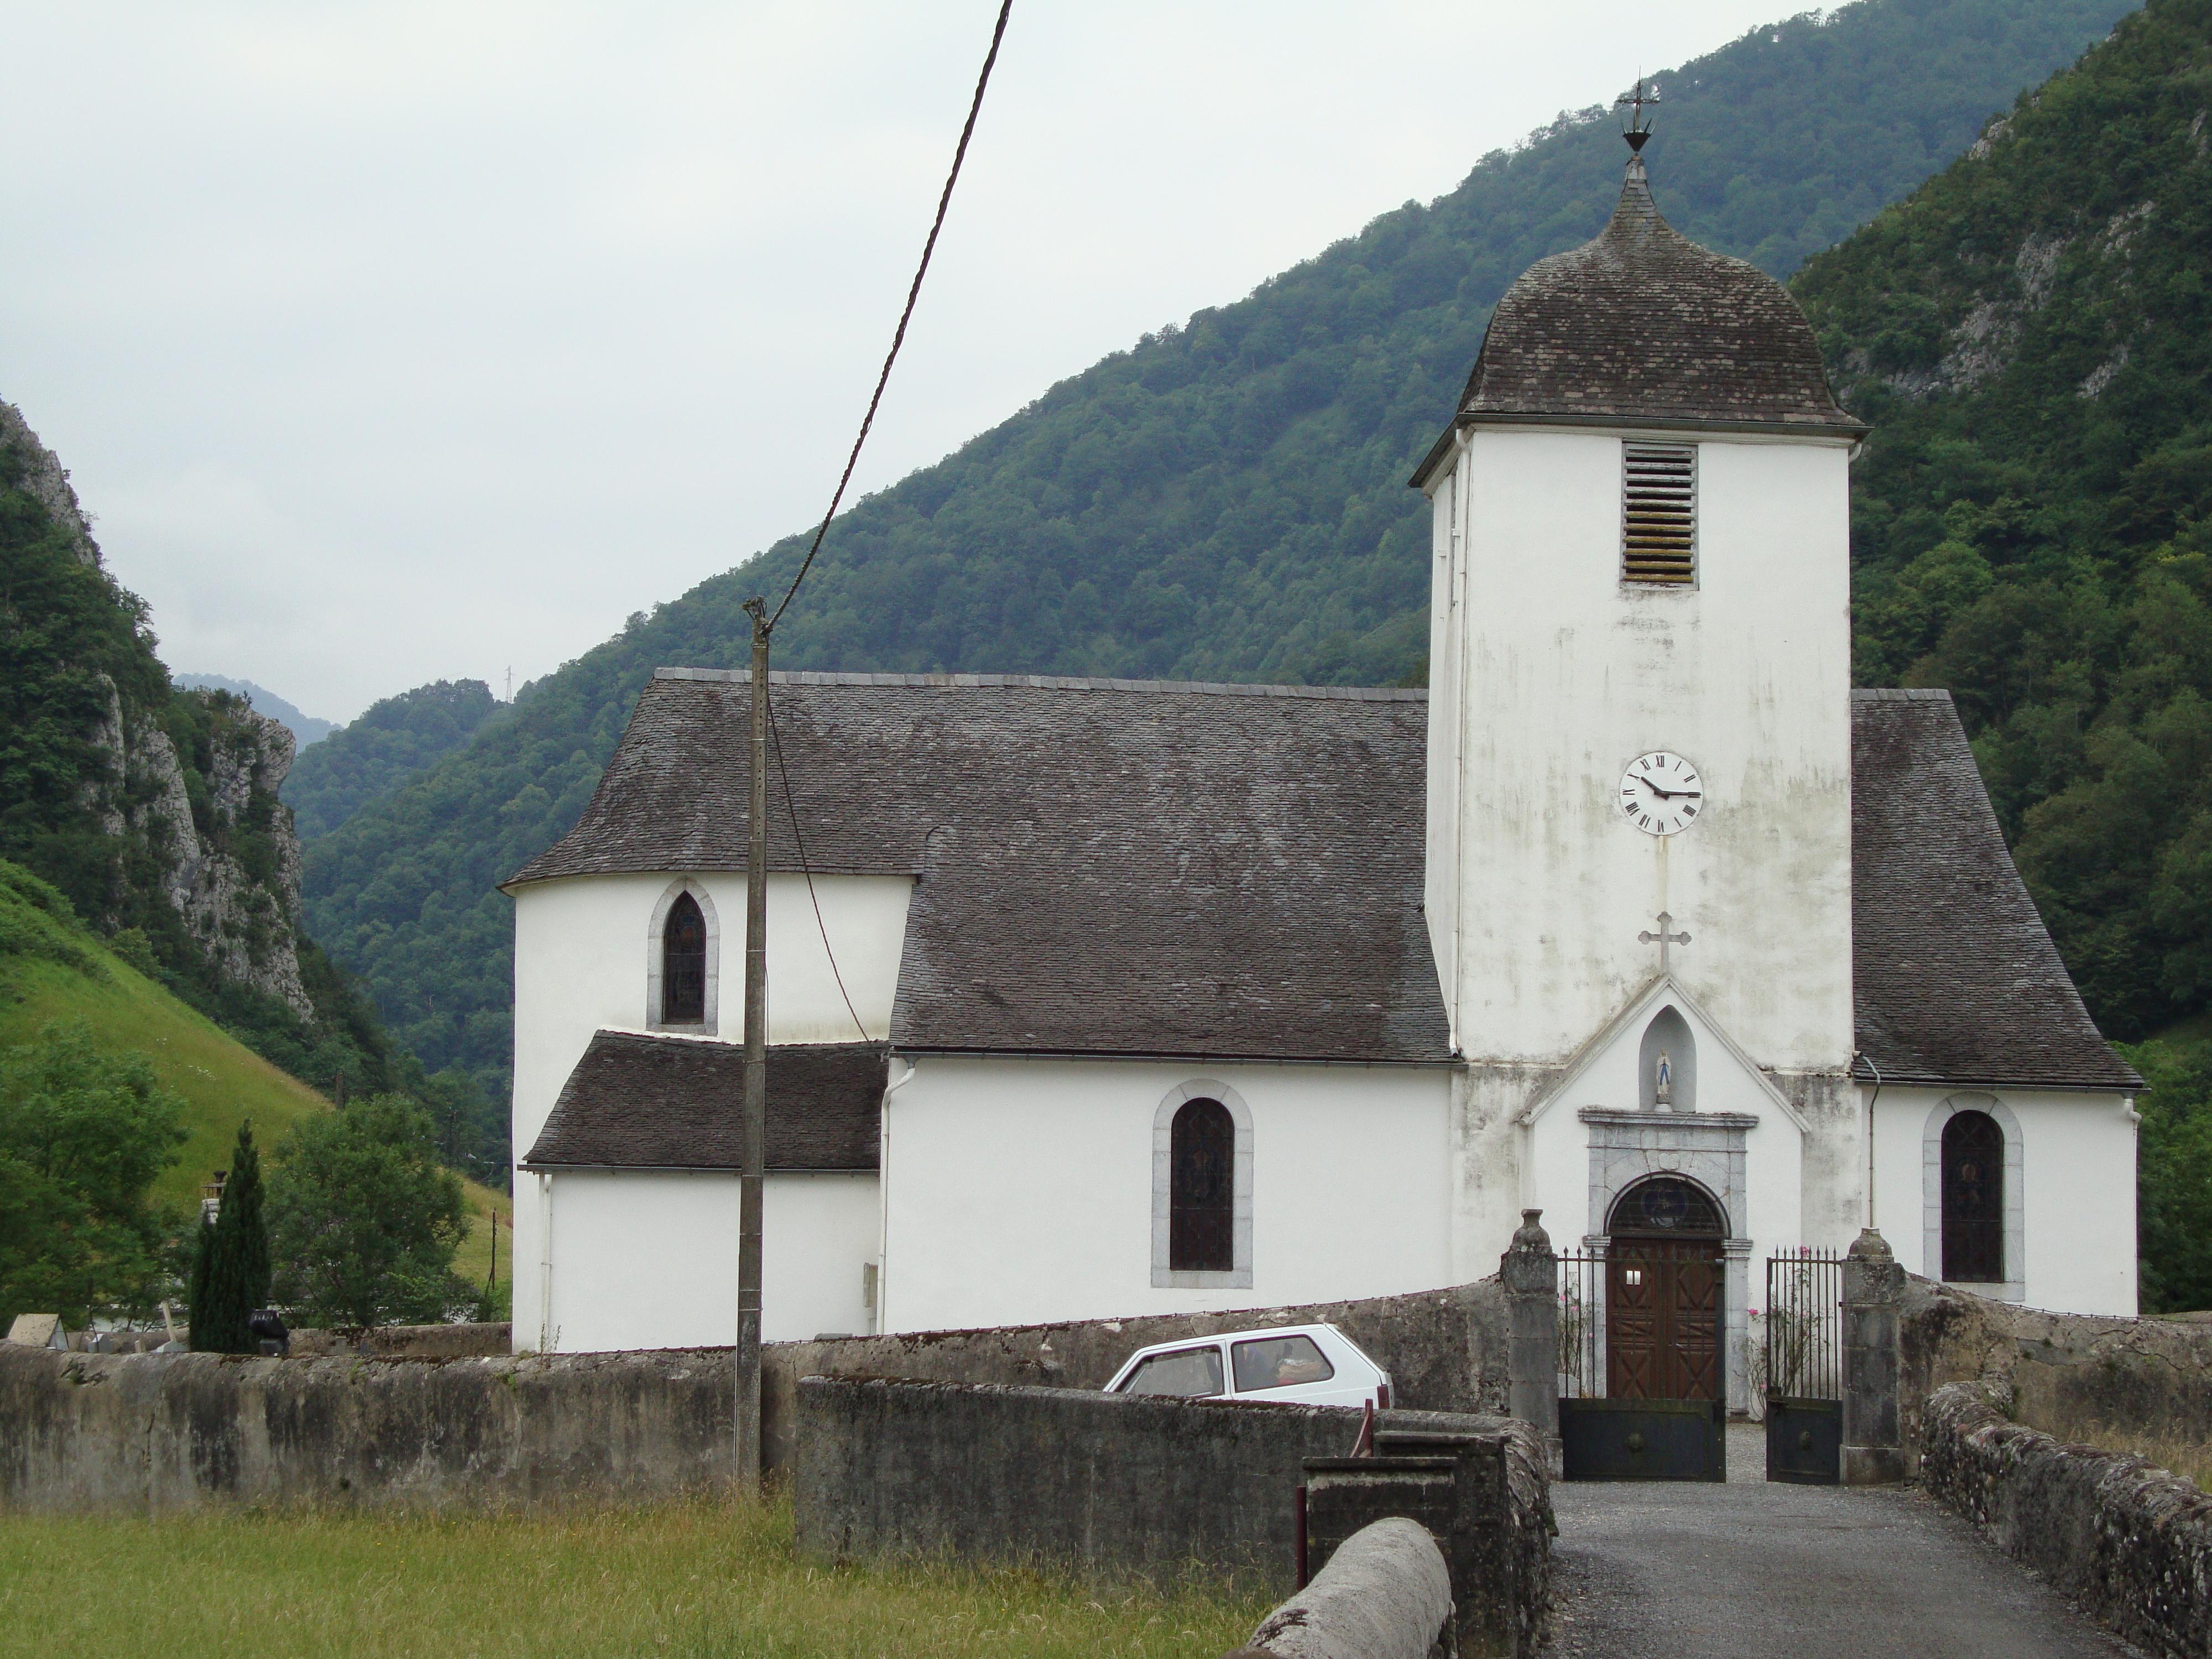 File:Escot (Pyr-Atl, Fr) église.JPG - Wikimedia Commons